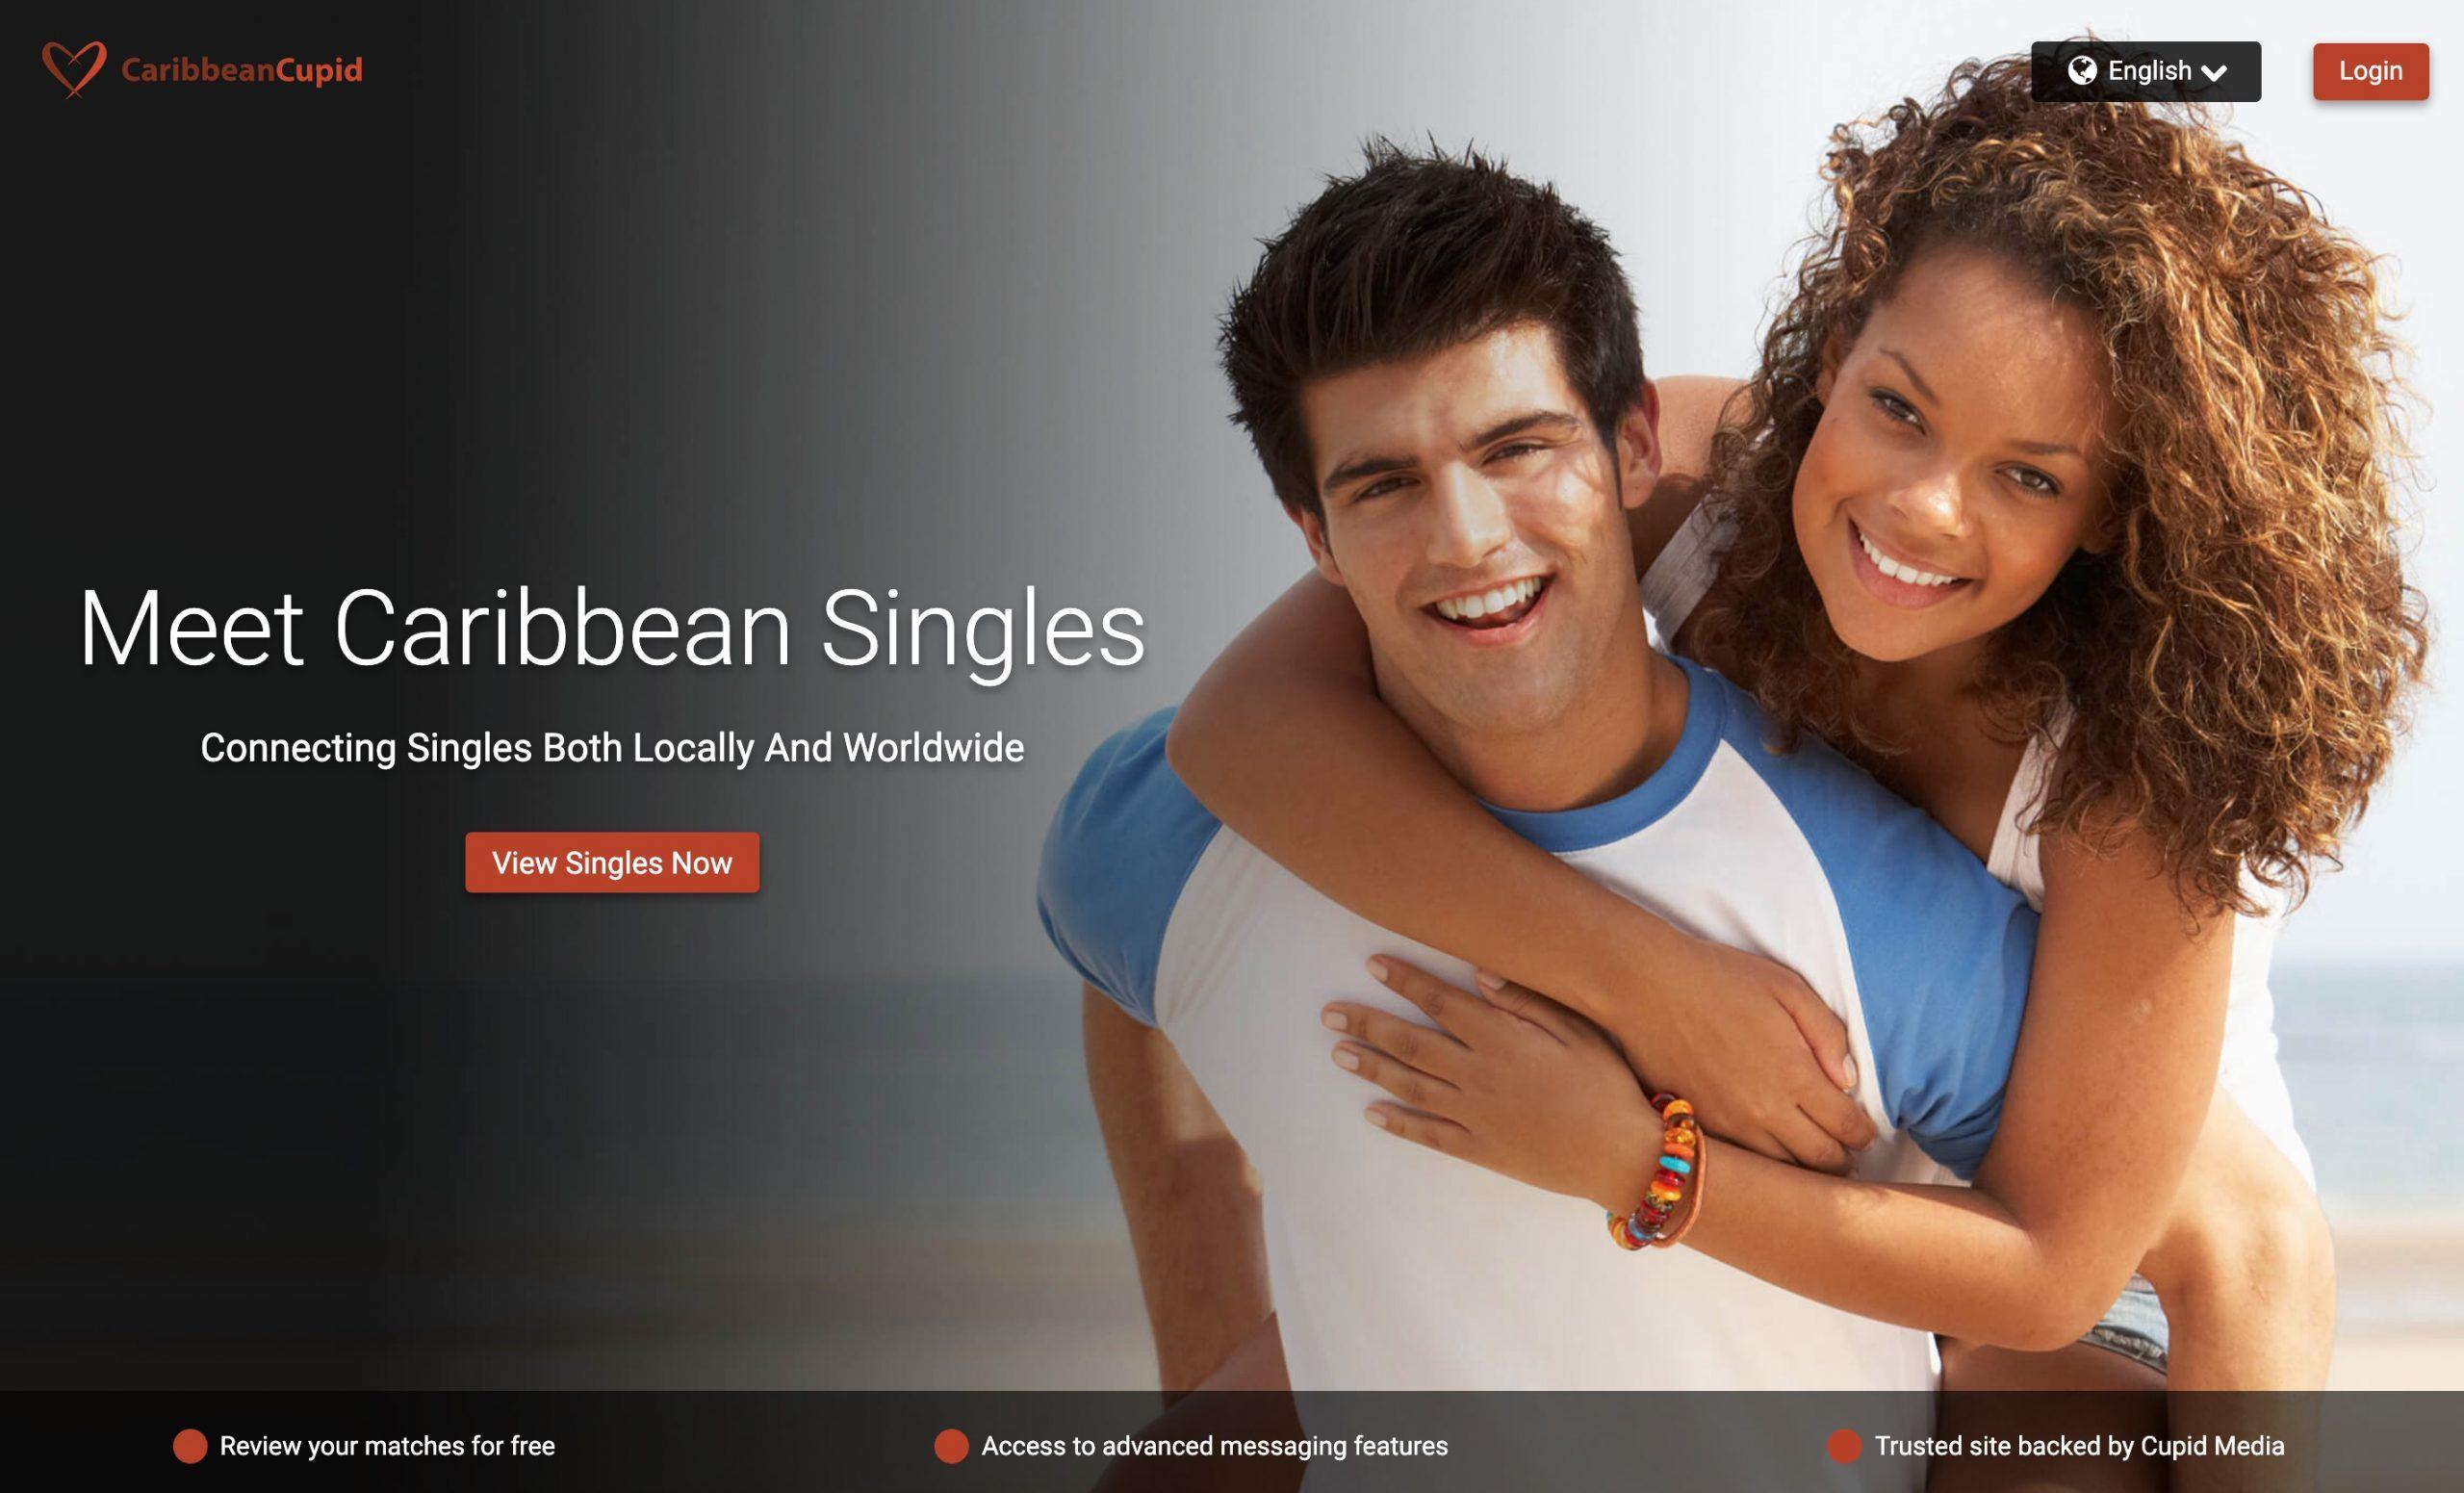 CarribeanCupid main page